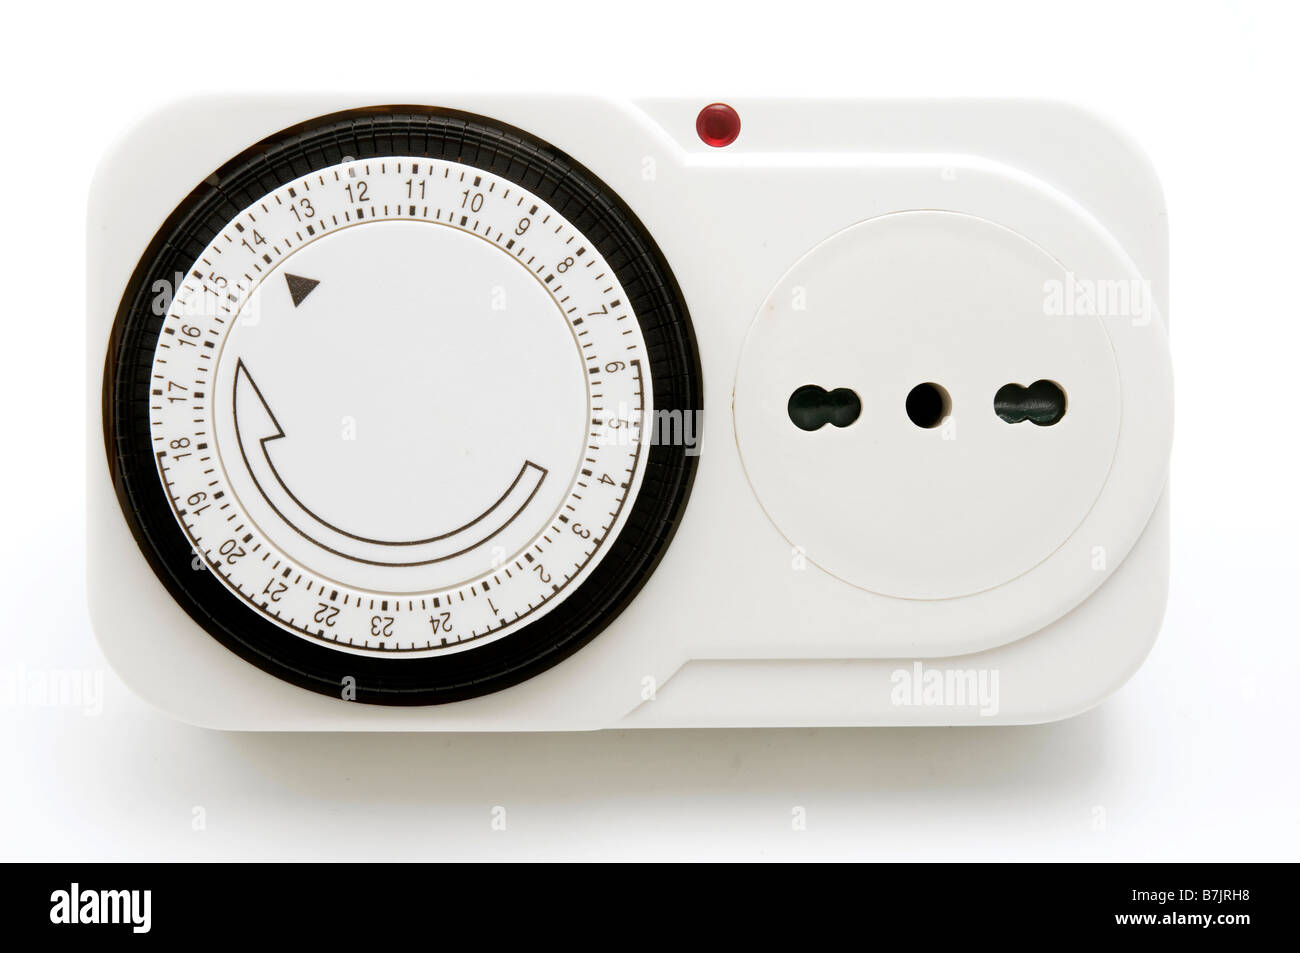 Timer Stockfotos & Timer Bilder - Alamy